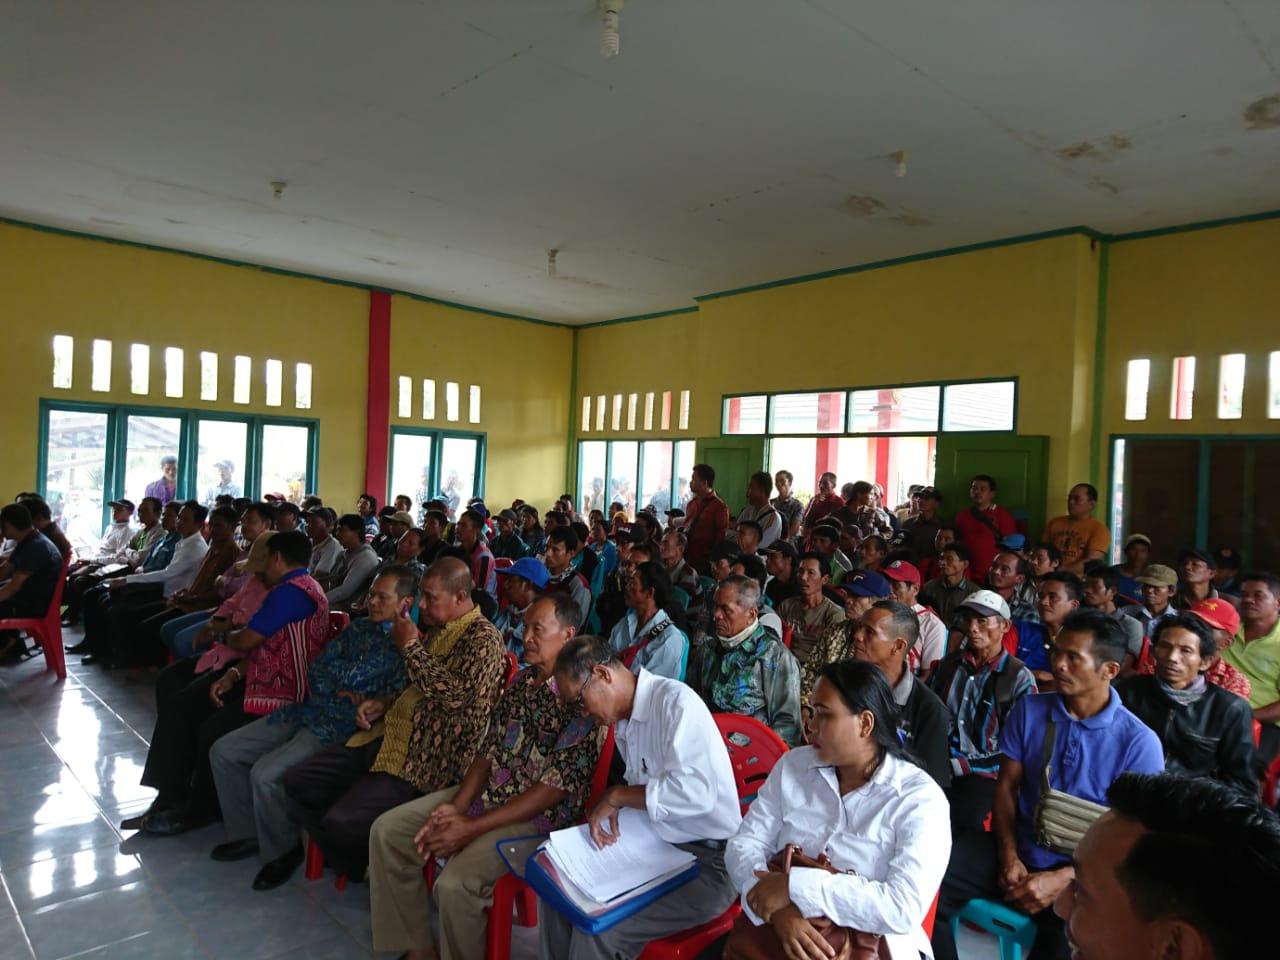 Foto--Suasana pertemuan antara DPRD dengan petani dan pihak PT.MKS, Rabu (12/2/2020).